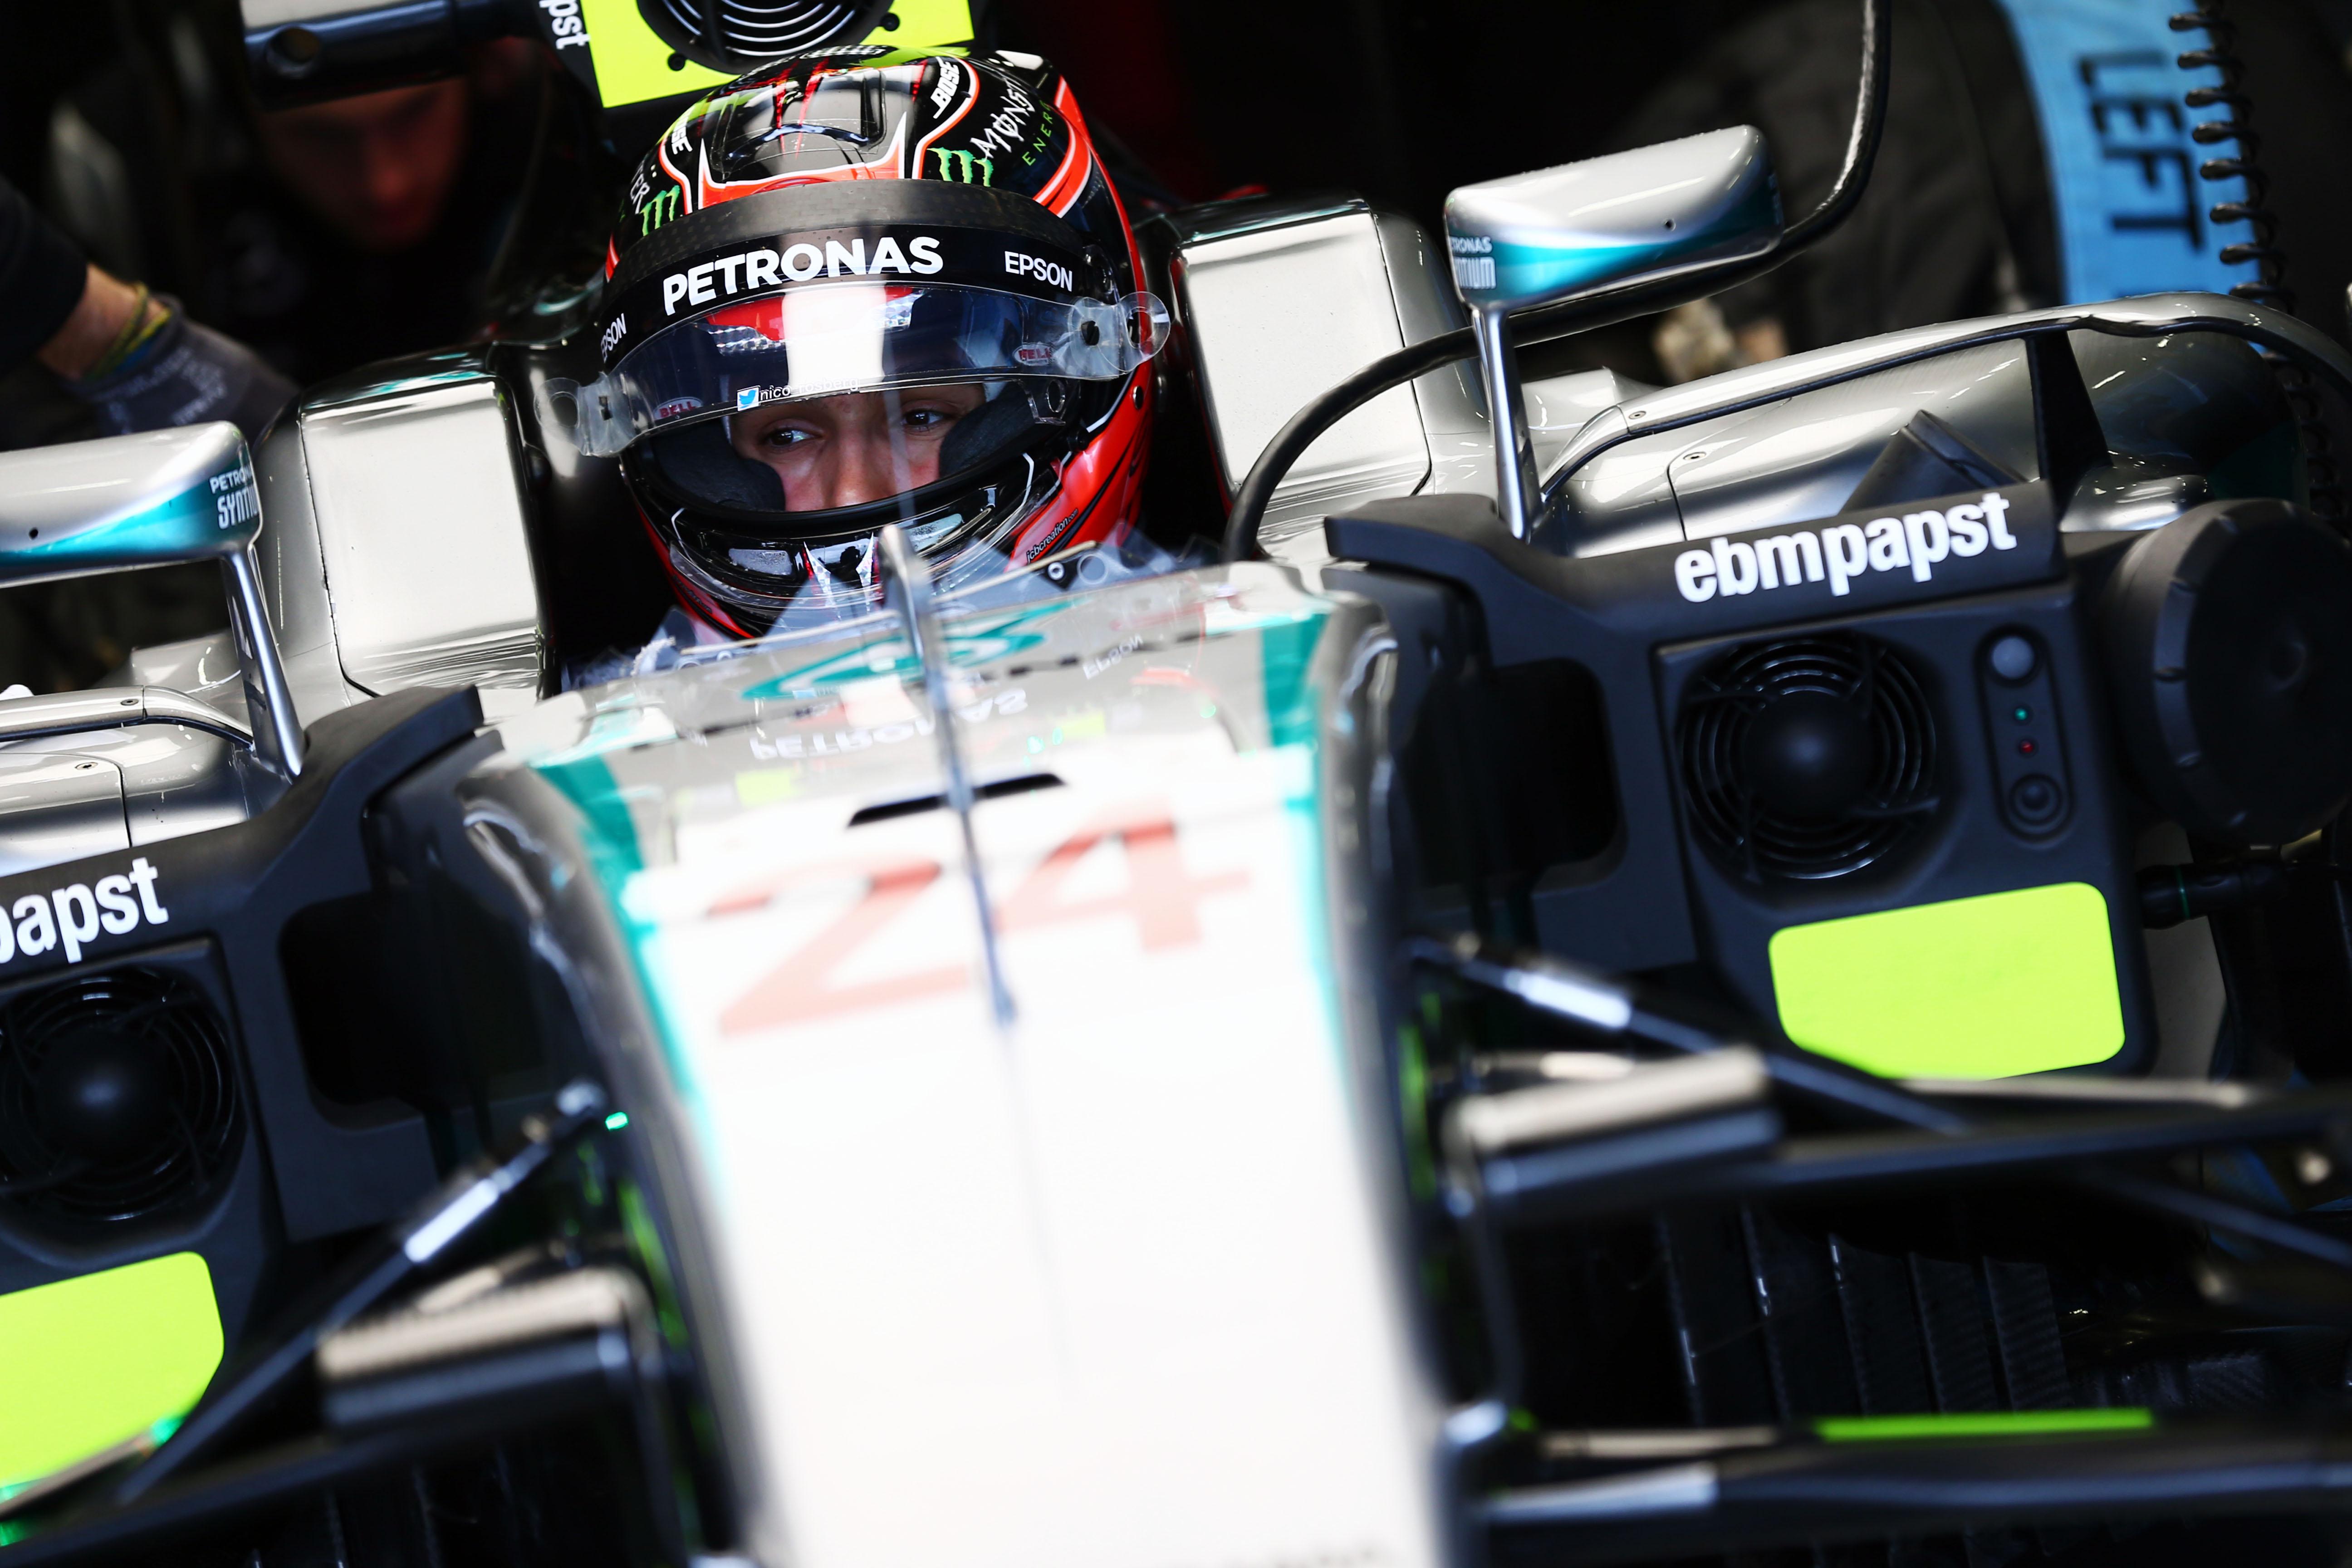 Motor Racing Formula One Testing In Season Test Day 1 Silverstone, England